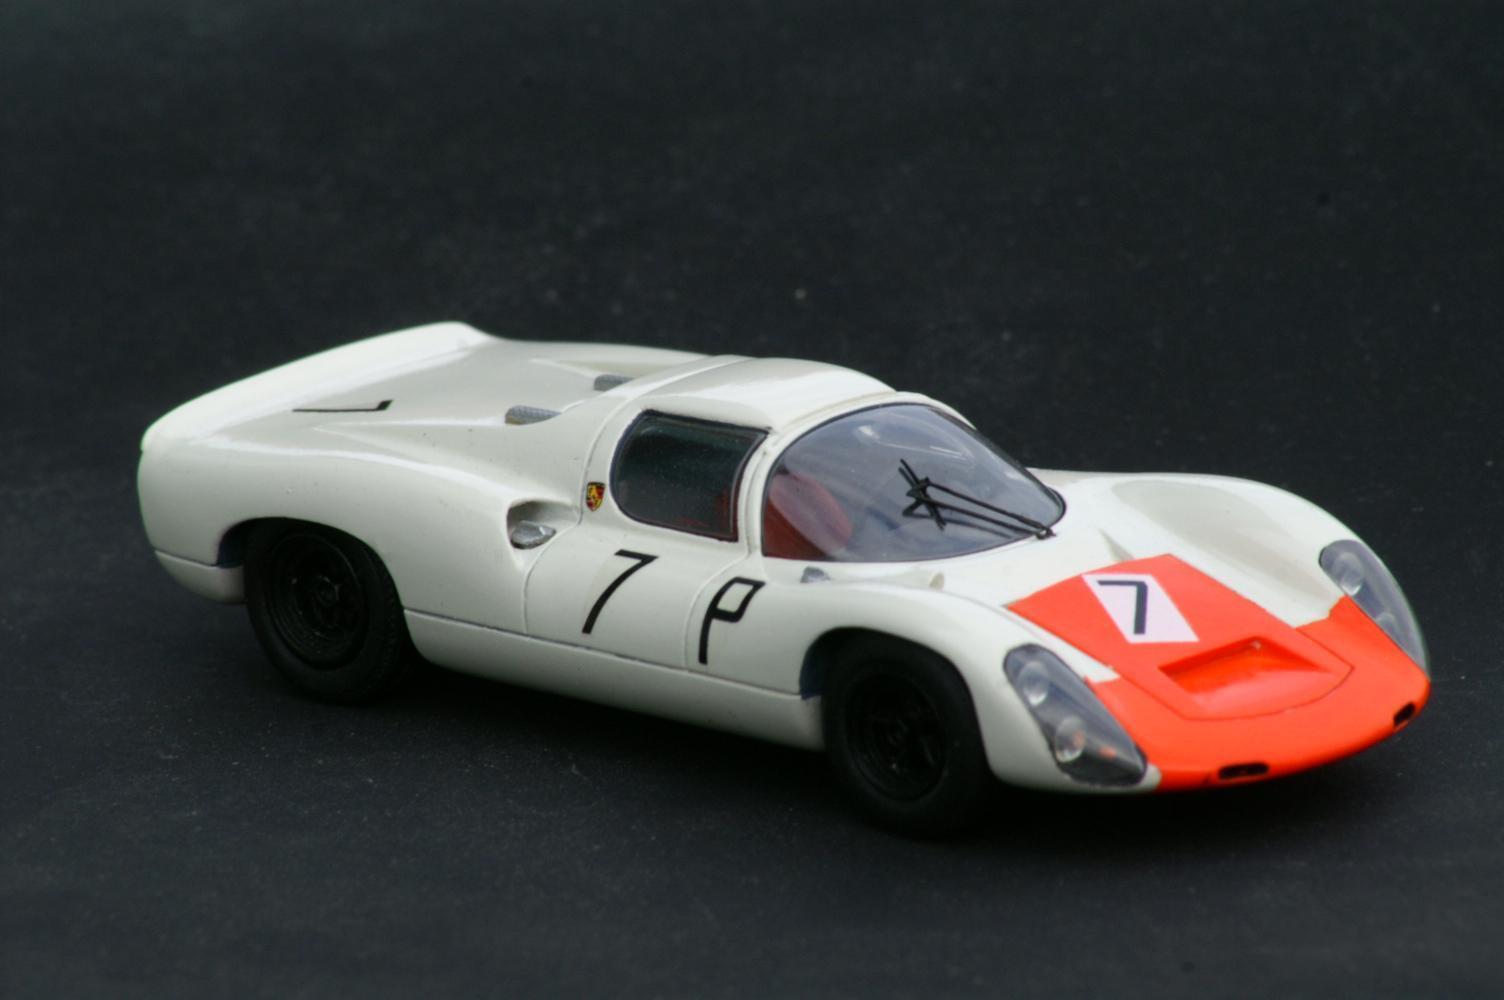 1 43   PORSCHE  910  8CYL  NURBURGbague  1967  VROOM  UNPAINTED  KIT  NO  SPARK  mieux acheter